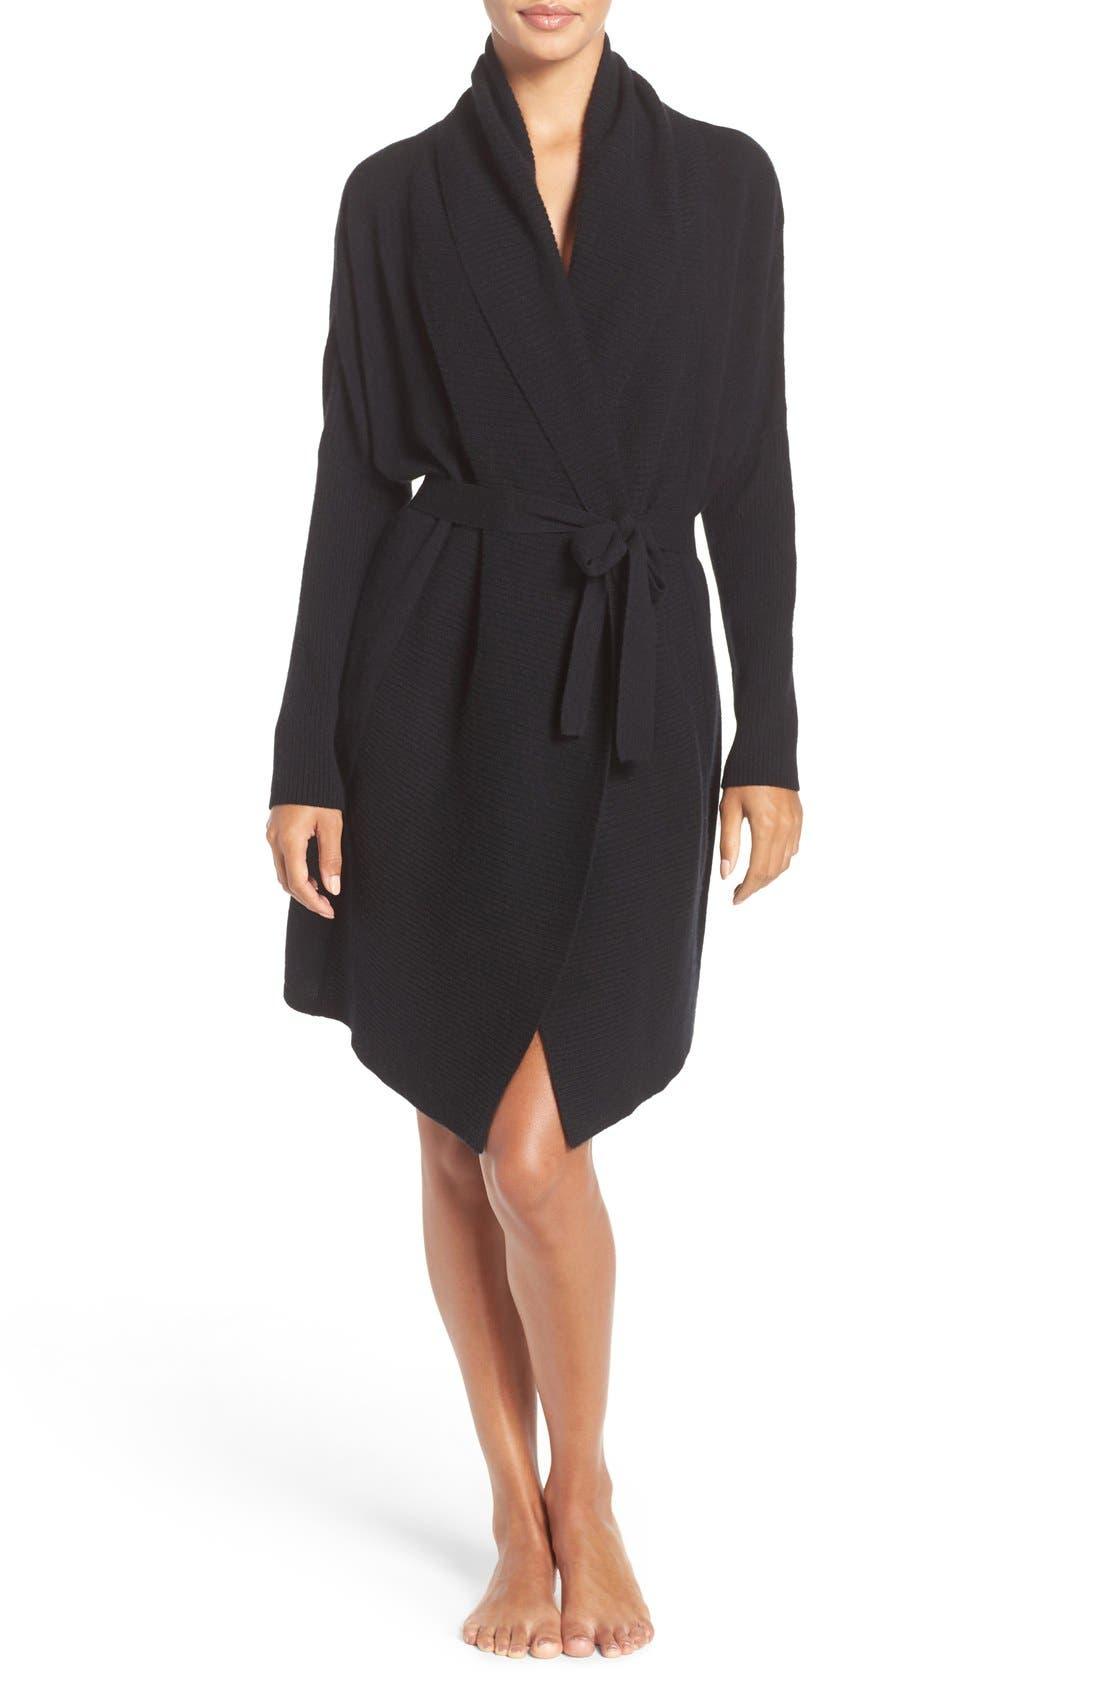 UGG 'Cheyenne' Cashmere Robe,                         Main,                         color, Black